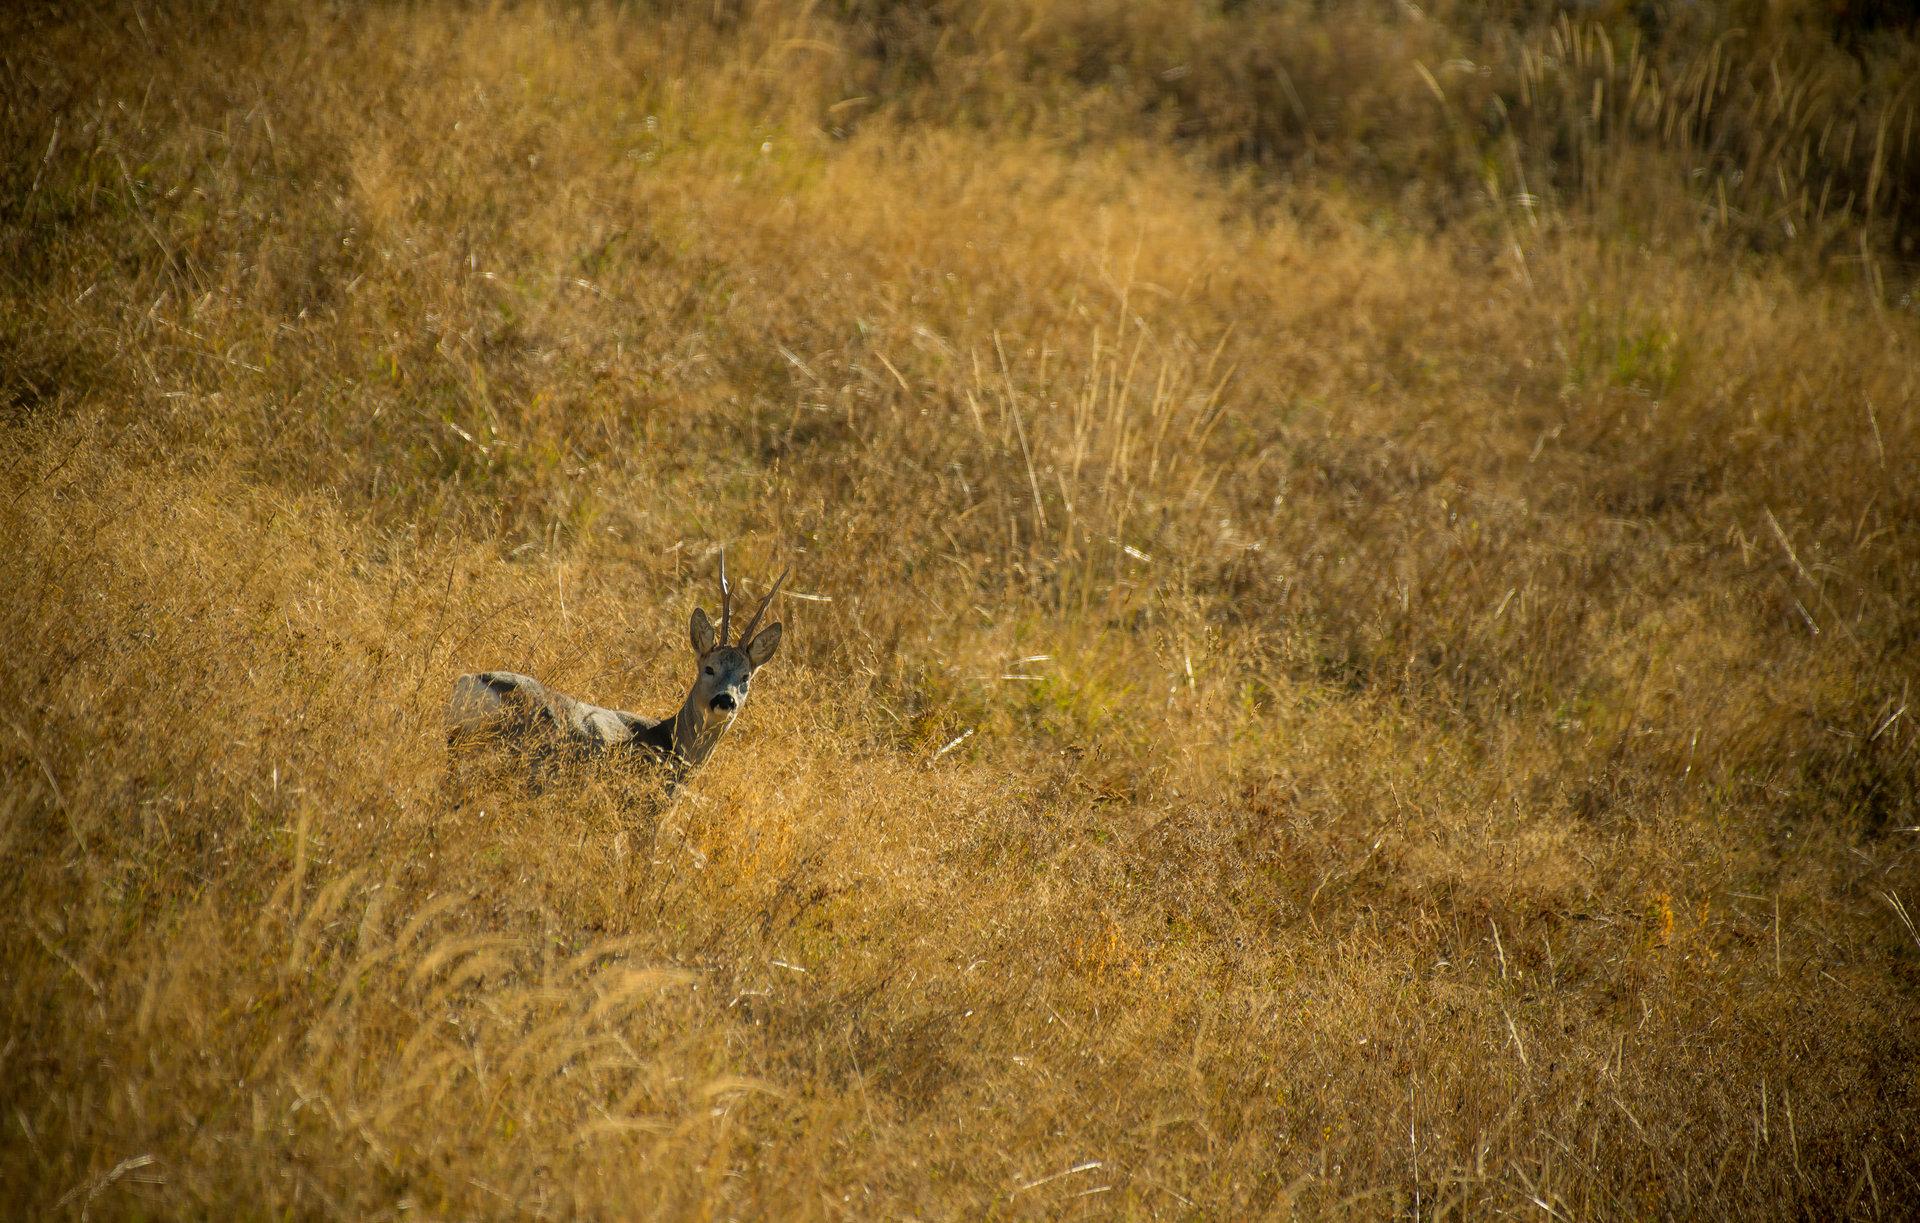 Photo in Wild life | Author Tihomir Petkov - Tihuana | PHOTO FORUM